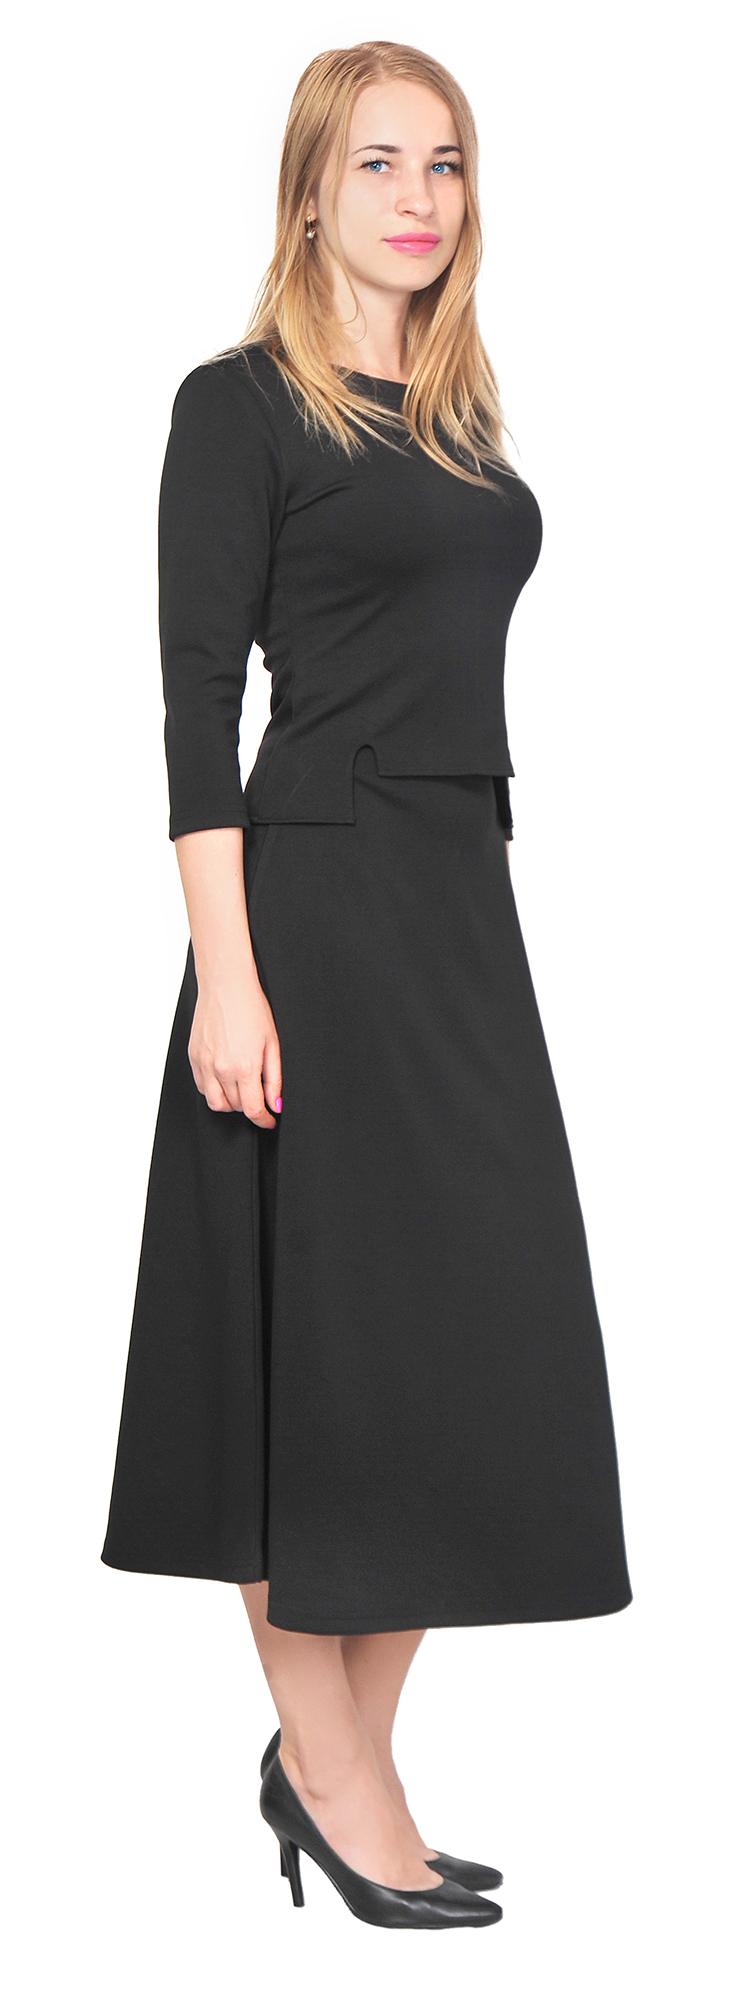 Women S Top Shirt A Line Midi Skirt Suit Set Casual Office Work